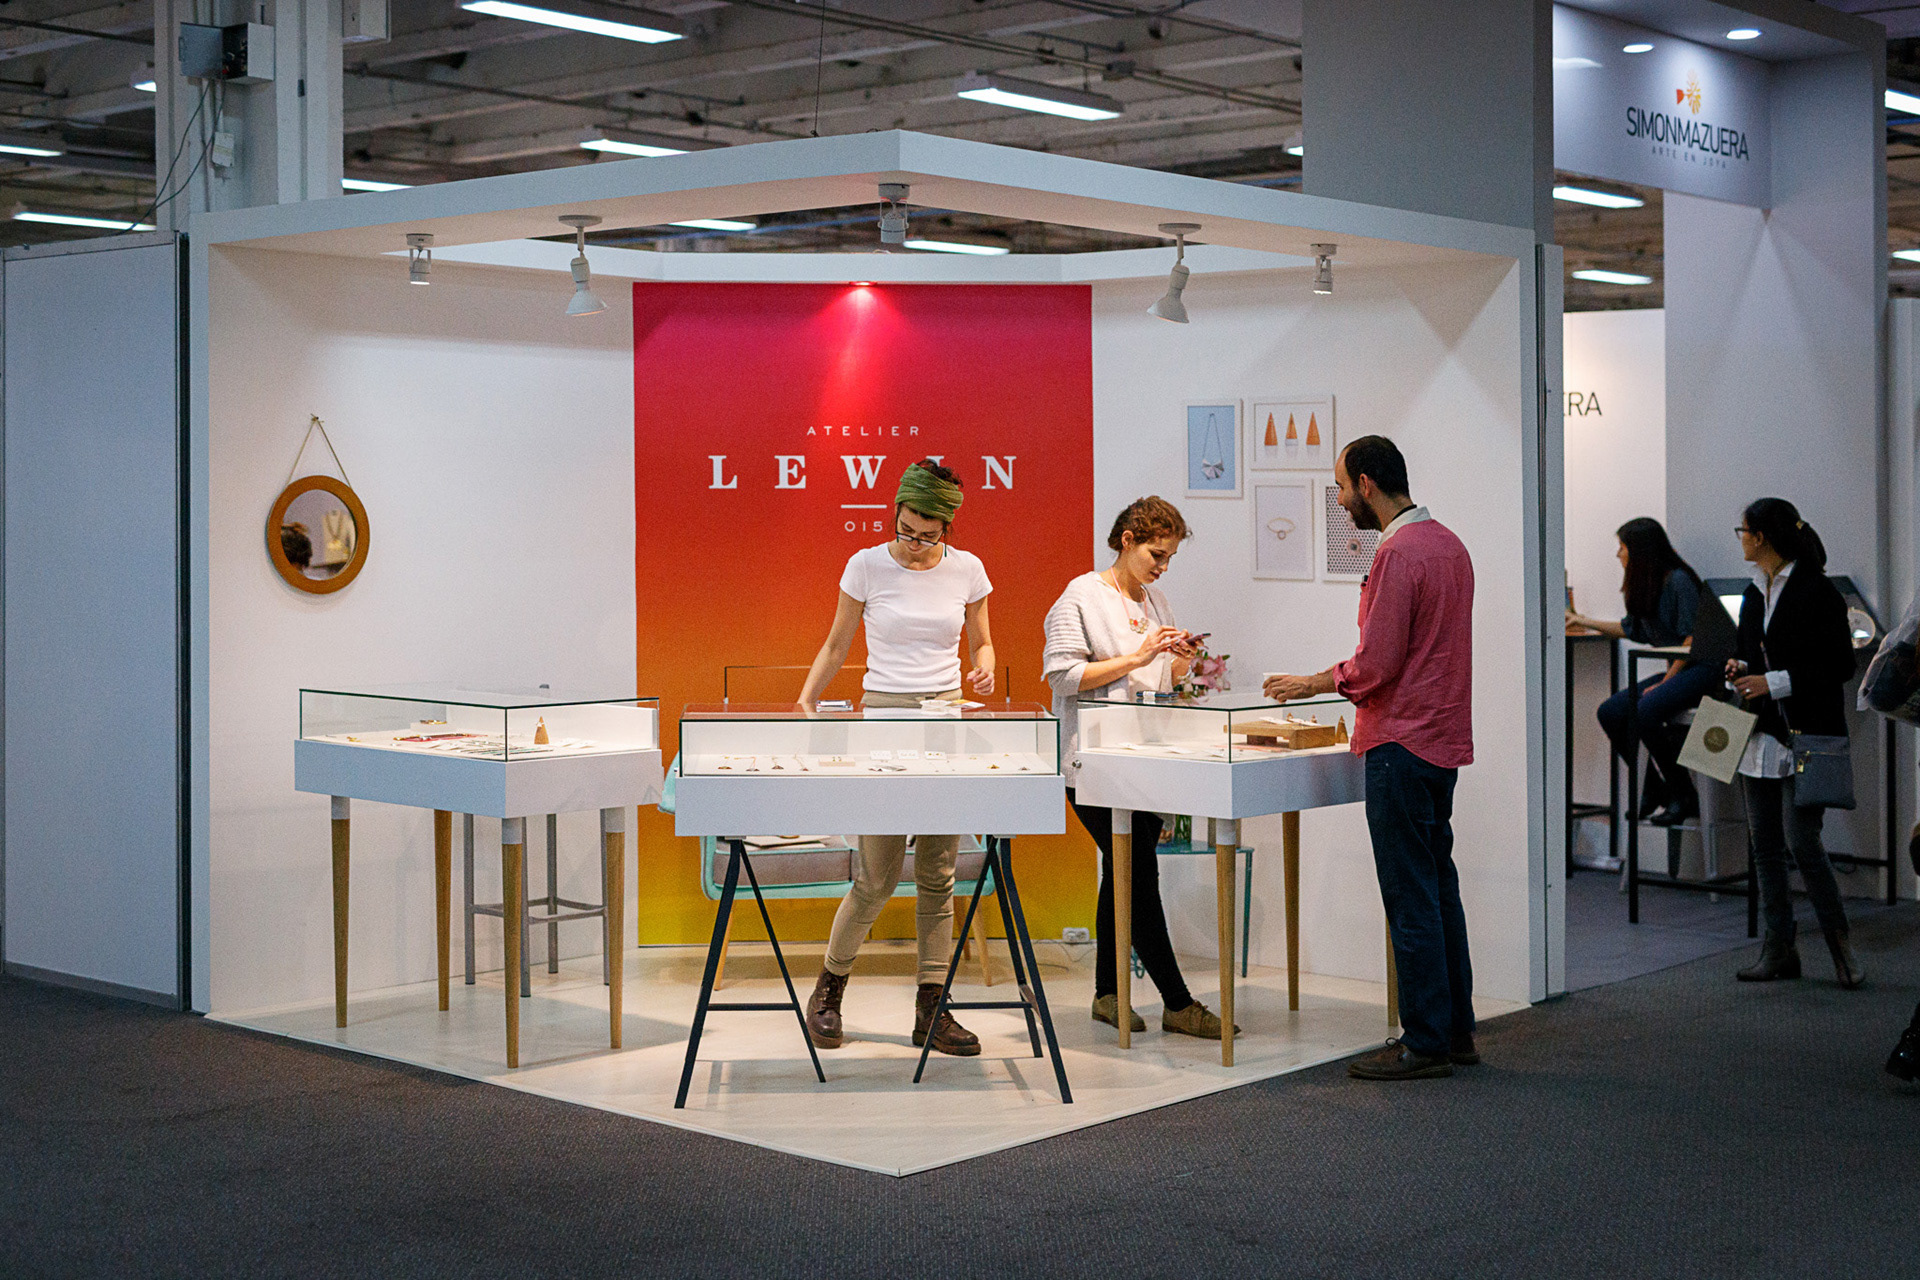 Dise O Interior Roko Design Stand Atelier Lewin Joyer A # Muebles Para Joyeria